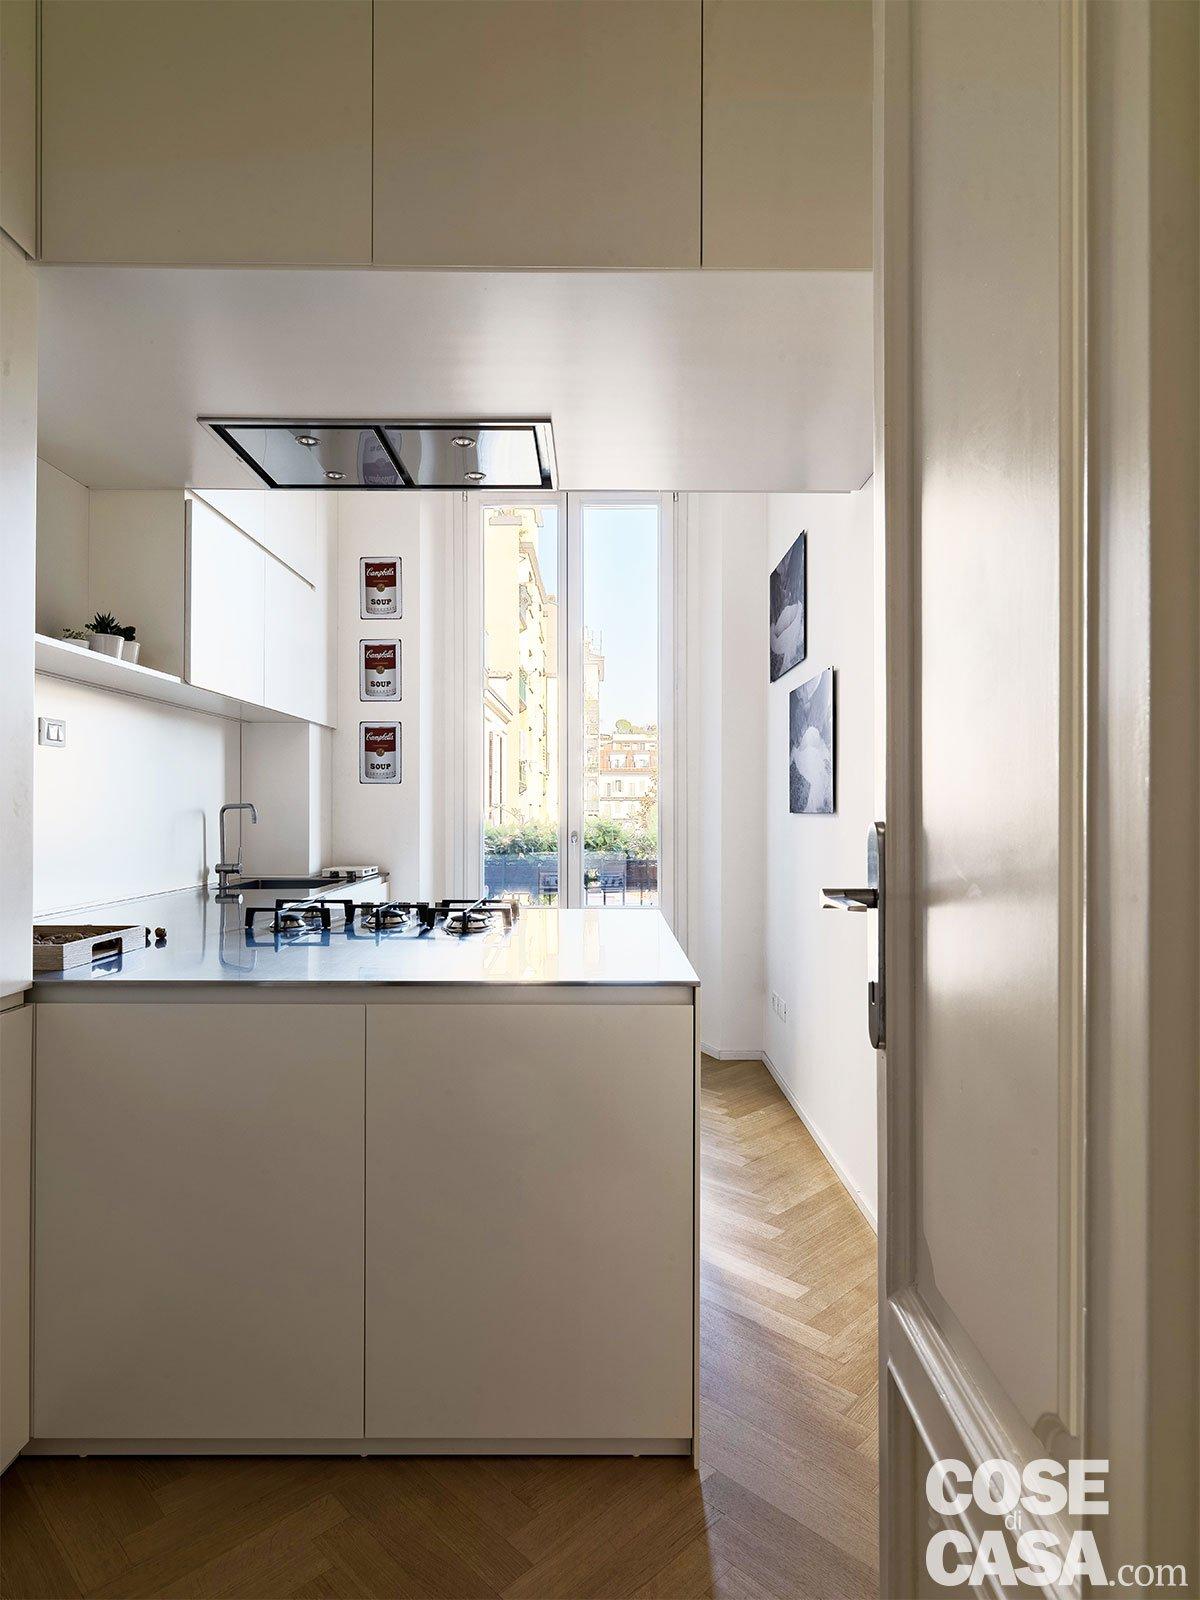 Vetrata cucina soggiorno in linea vista apartments - Cucina con vetrata a vista ...